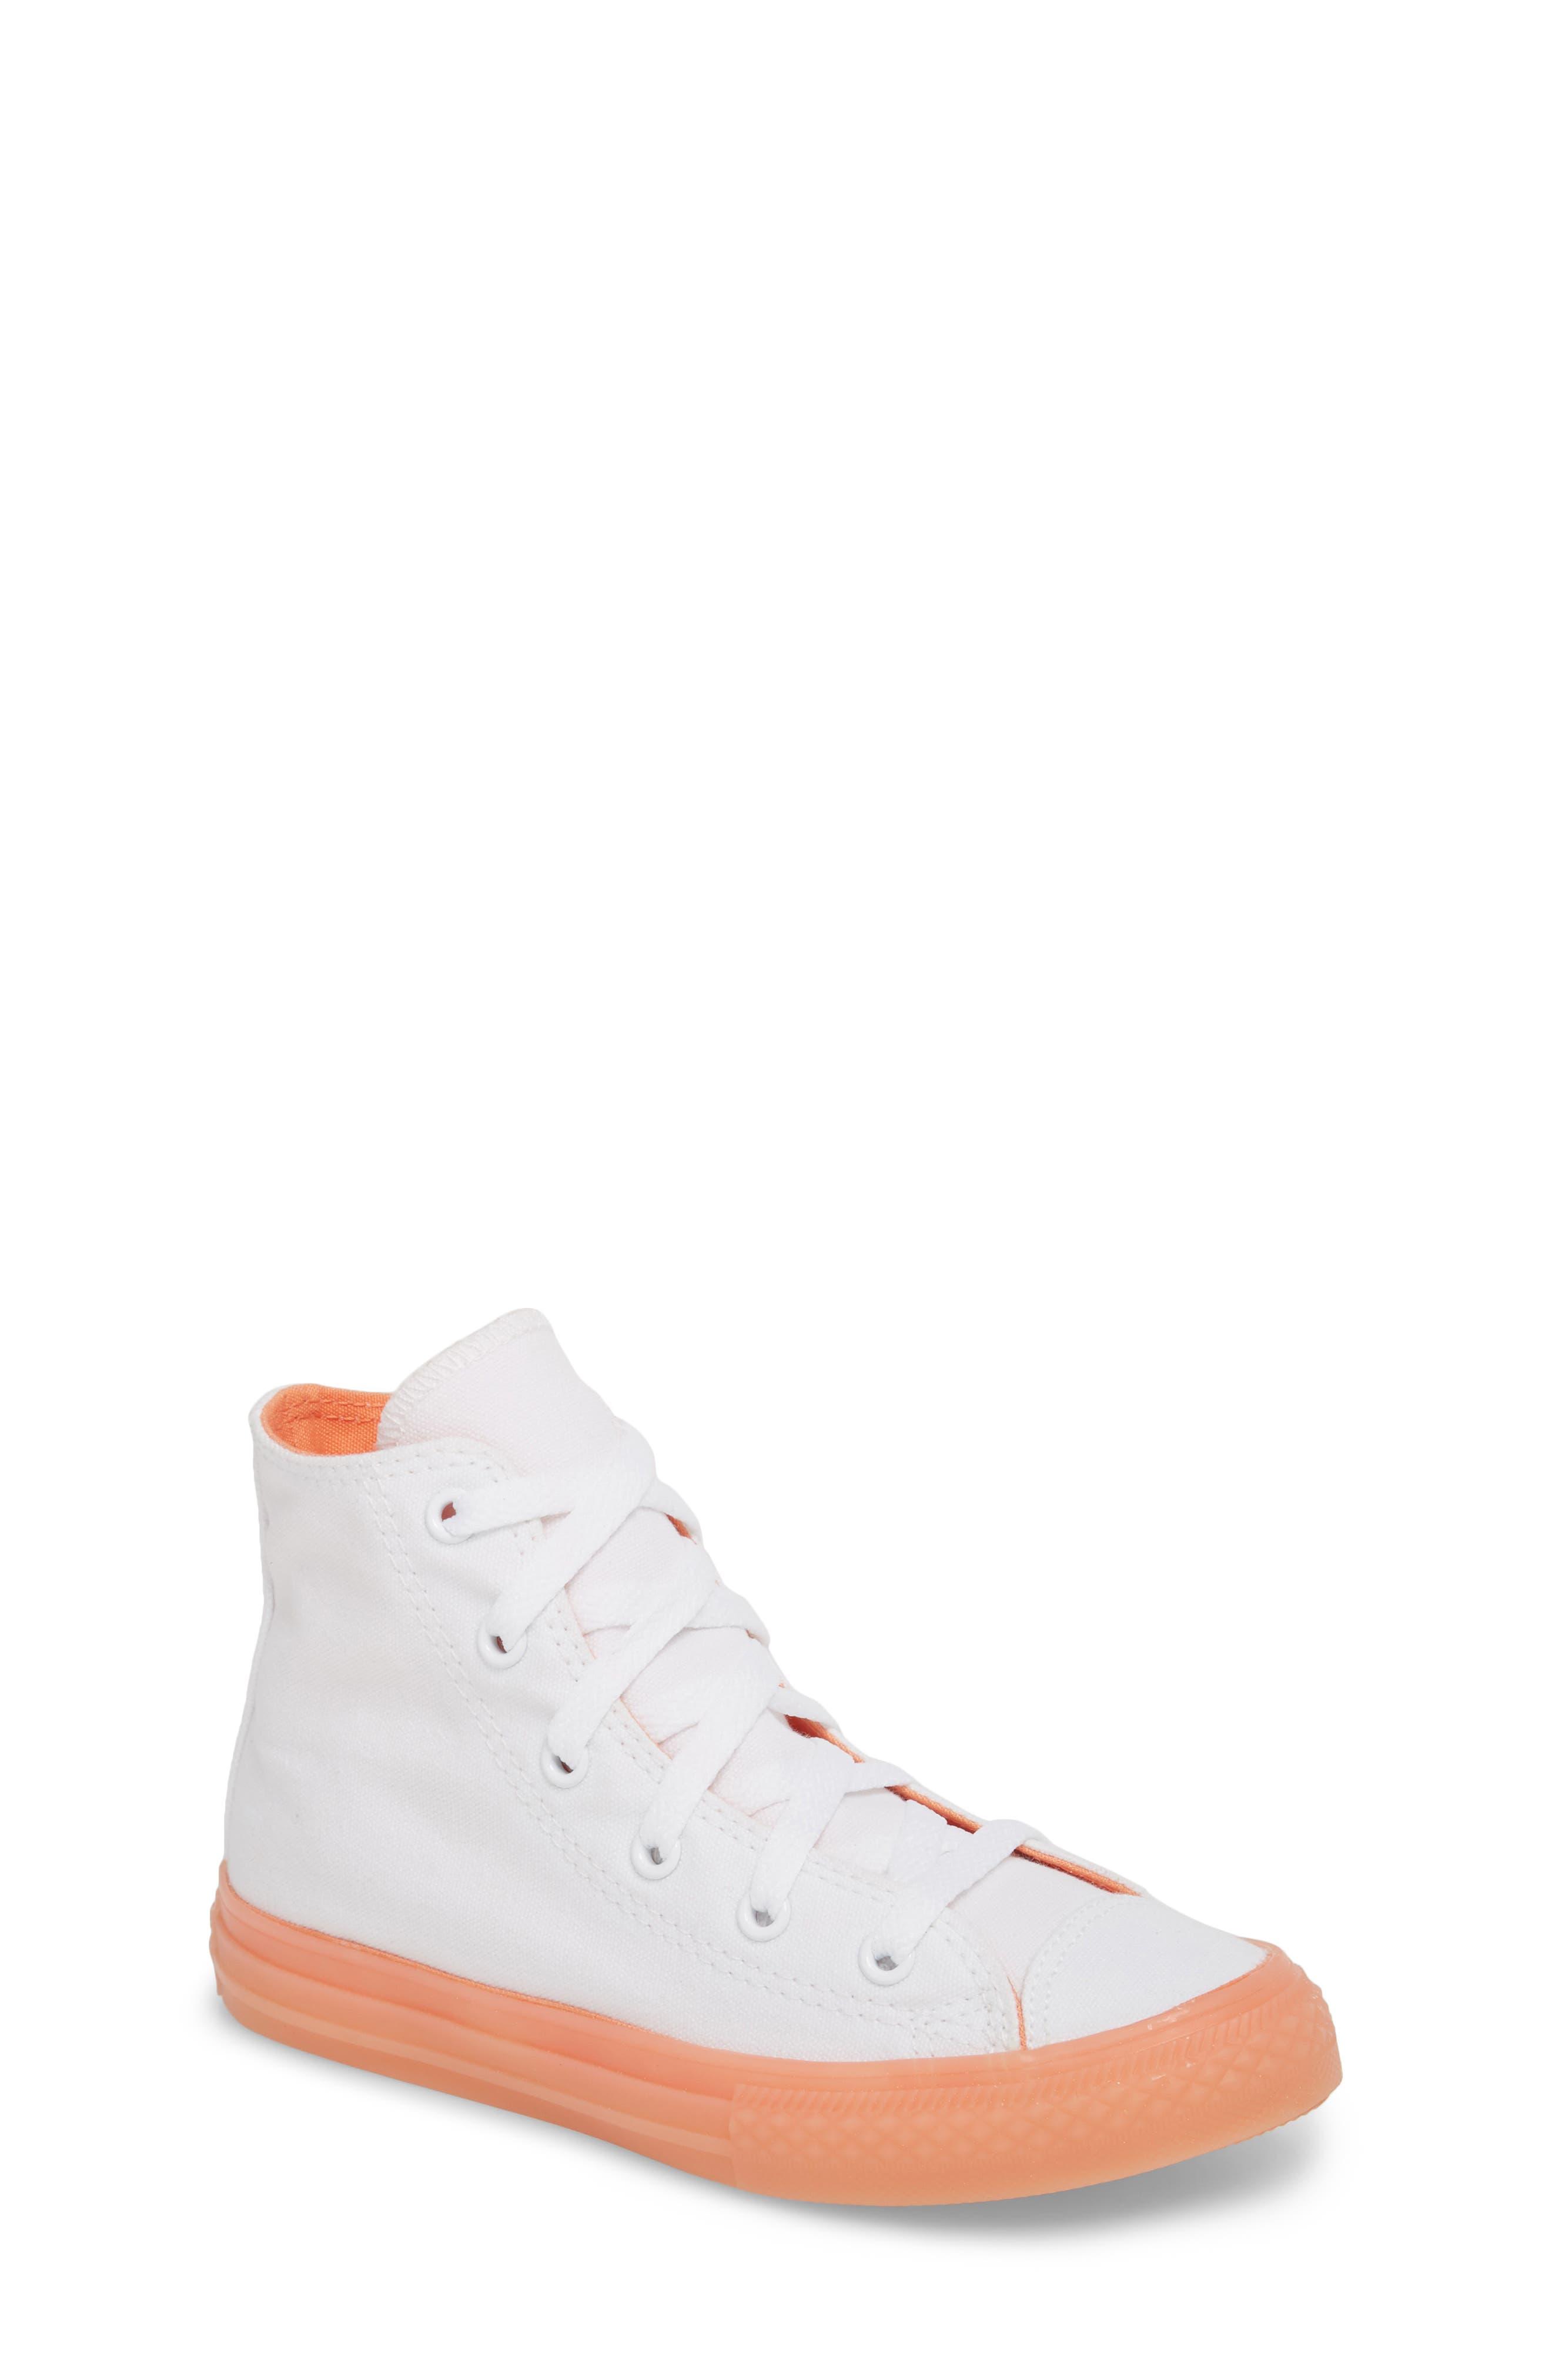 Converse Chuck Taylor® All Star® Jelly High Top Sneaker (Baby, Walker, Toddler, Little Kid & Big Kid)